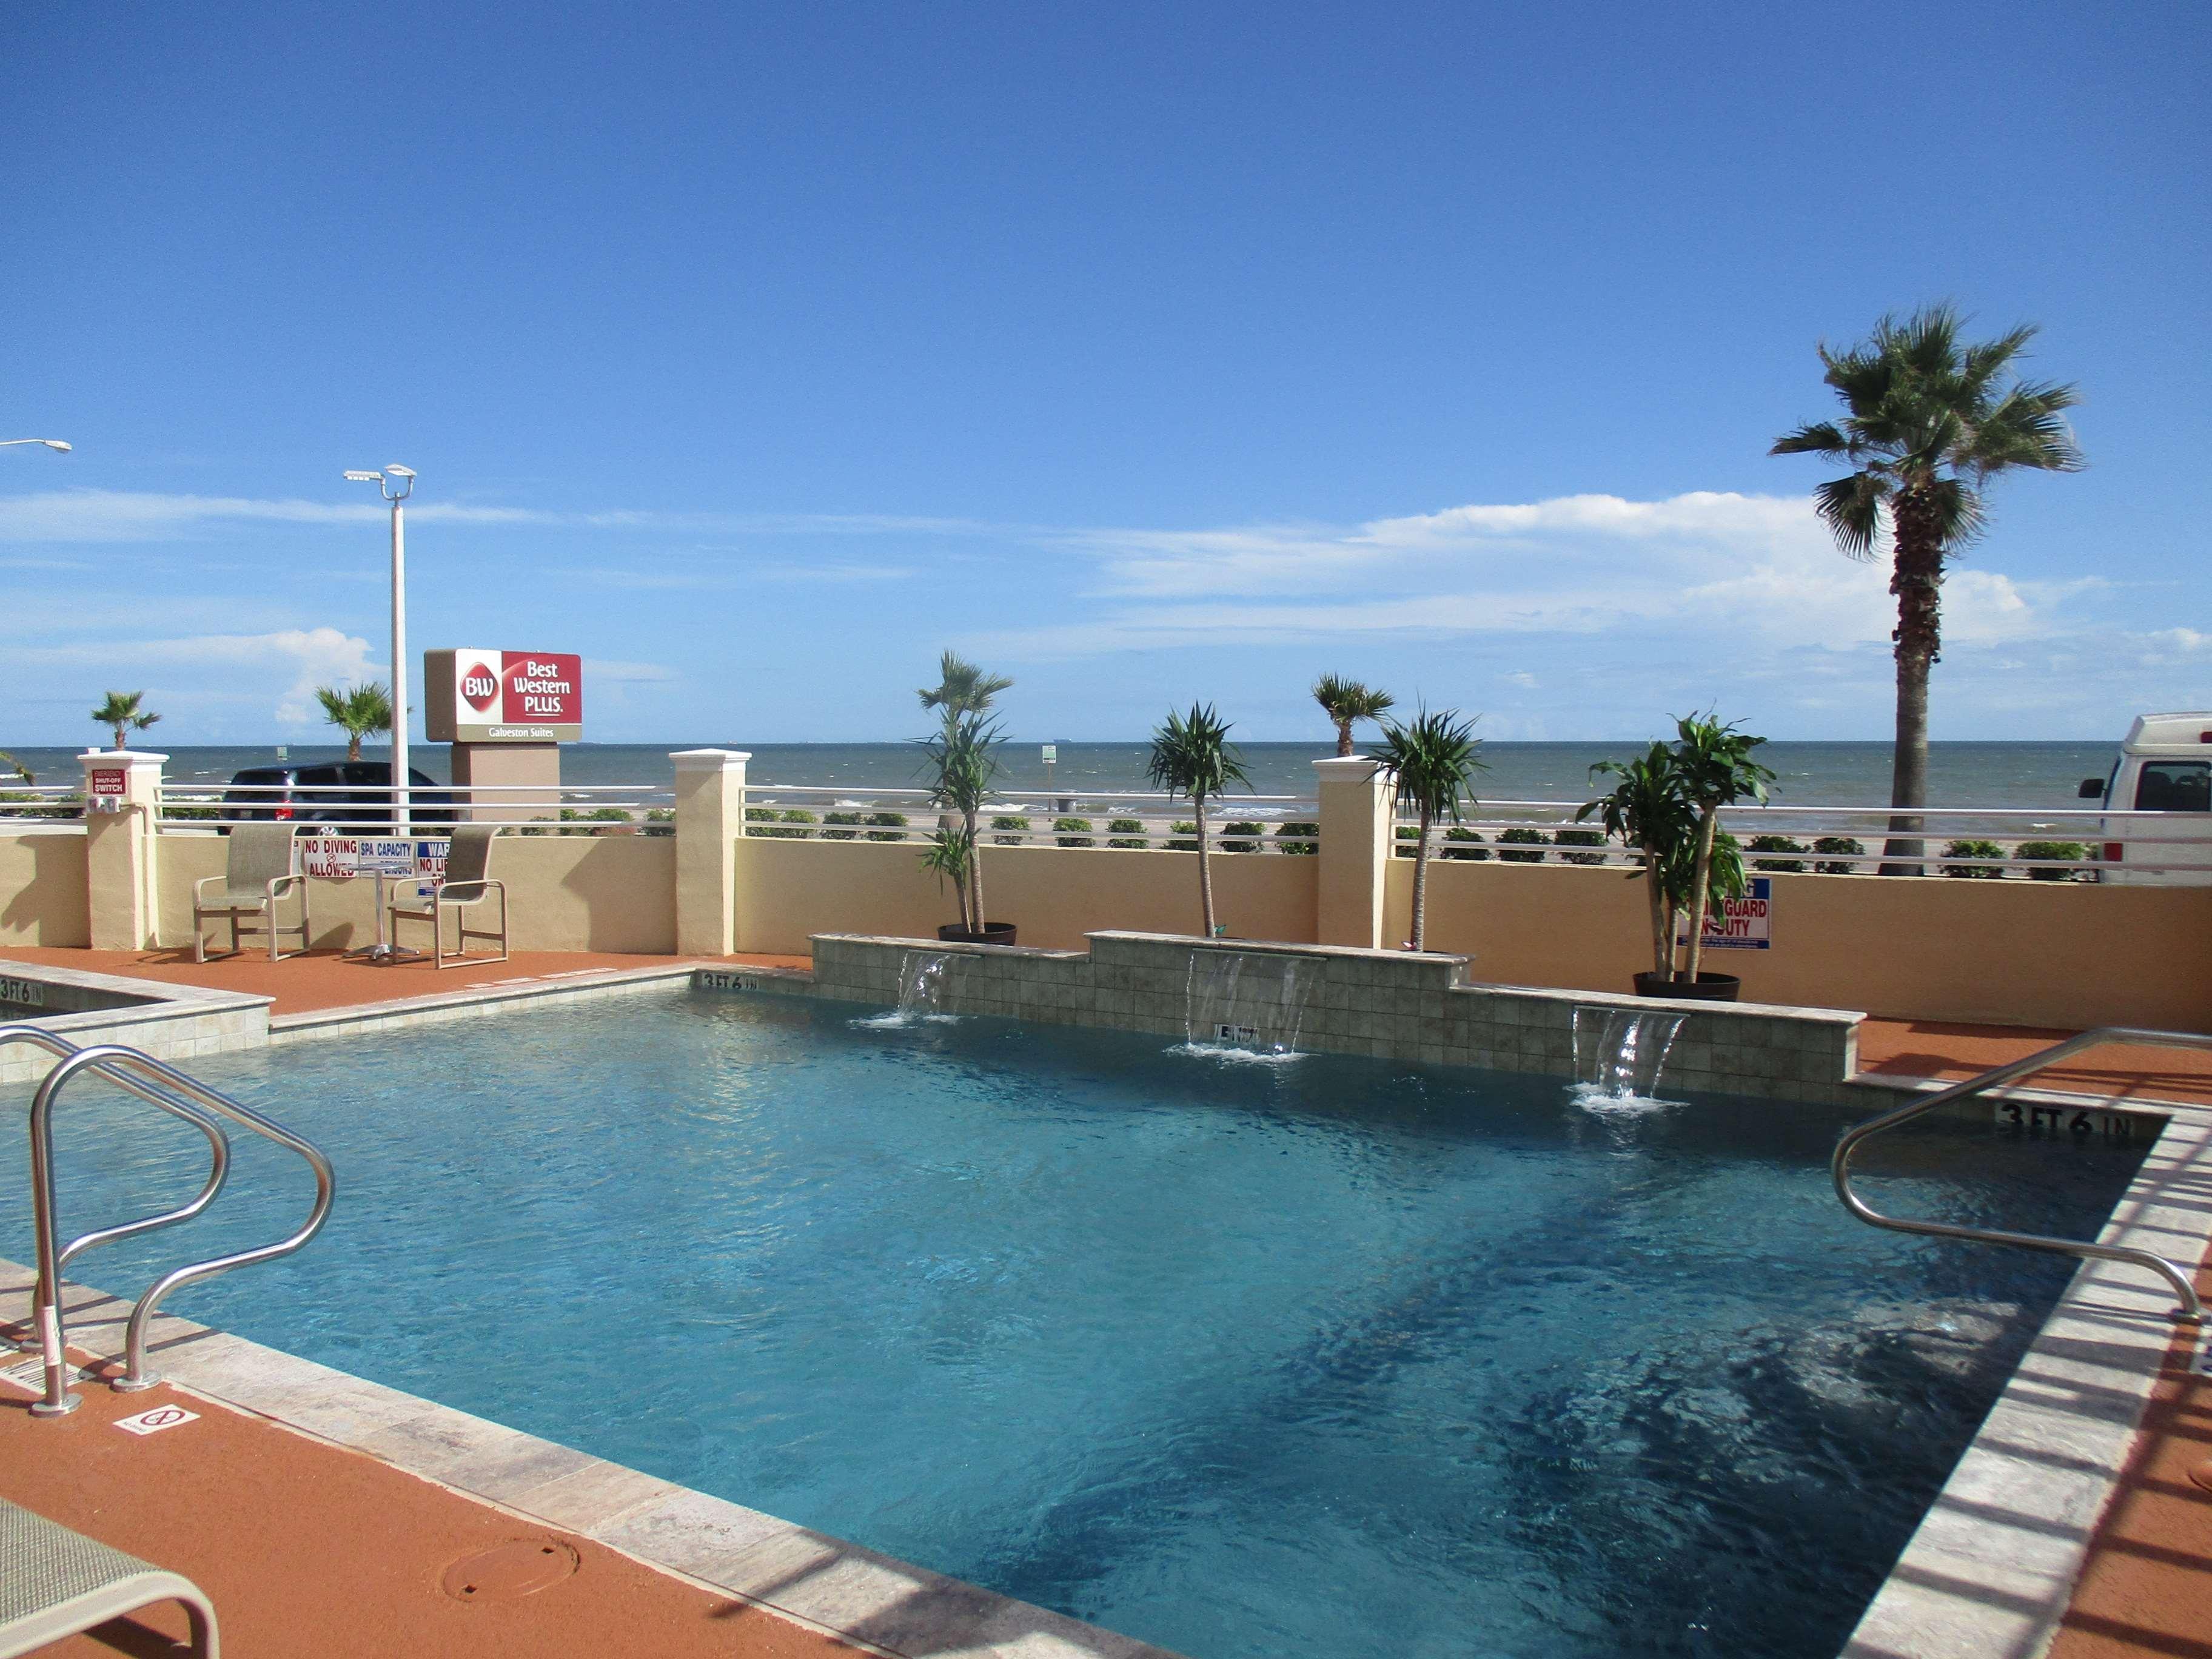 tx background hotel garden decor diver marvelous beautiful hotels beach talks inside palm gallon moody a near galveston biologist gardens